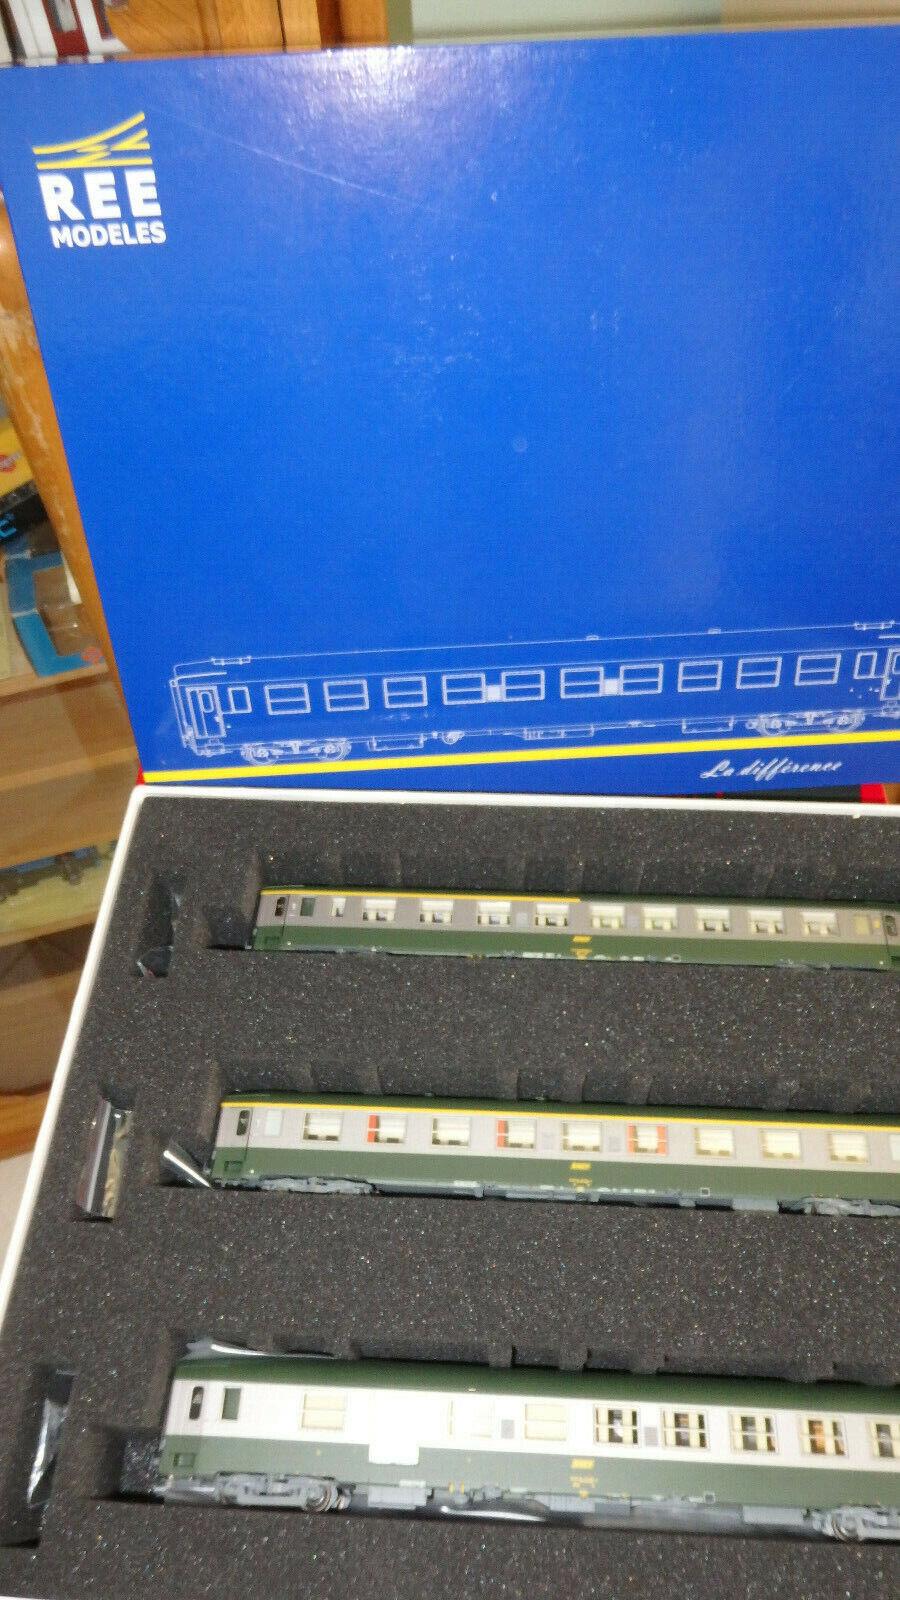 Ree Modelles VB-099 Set Mixta 1 2 CL, 2a Clase   Maletero Librea C160 Grün 302